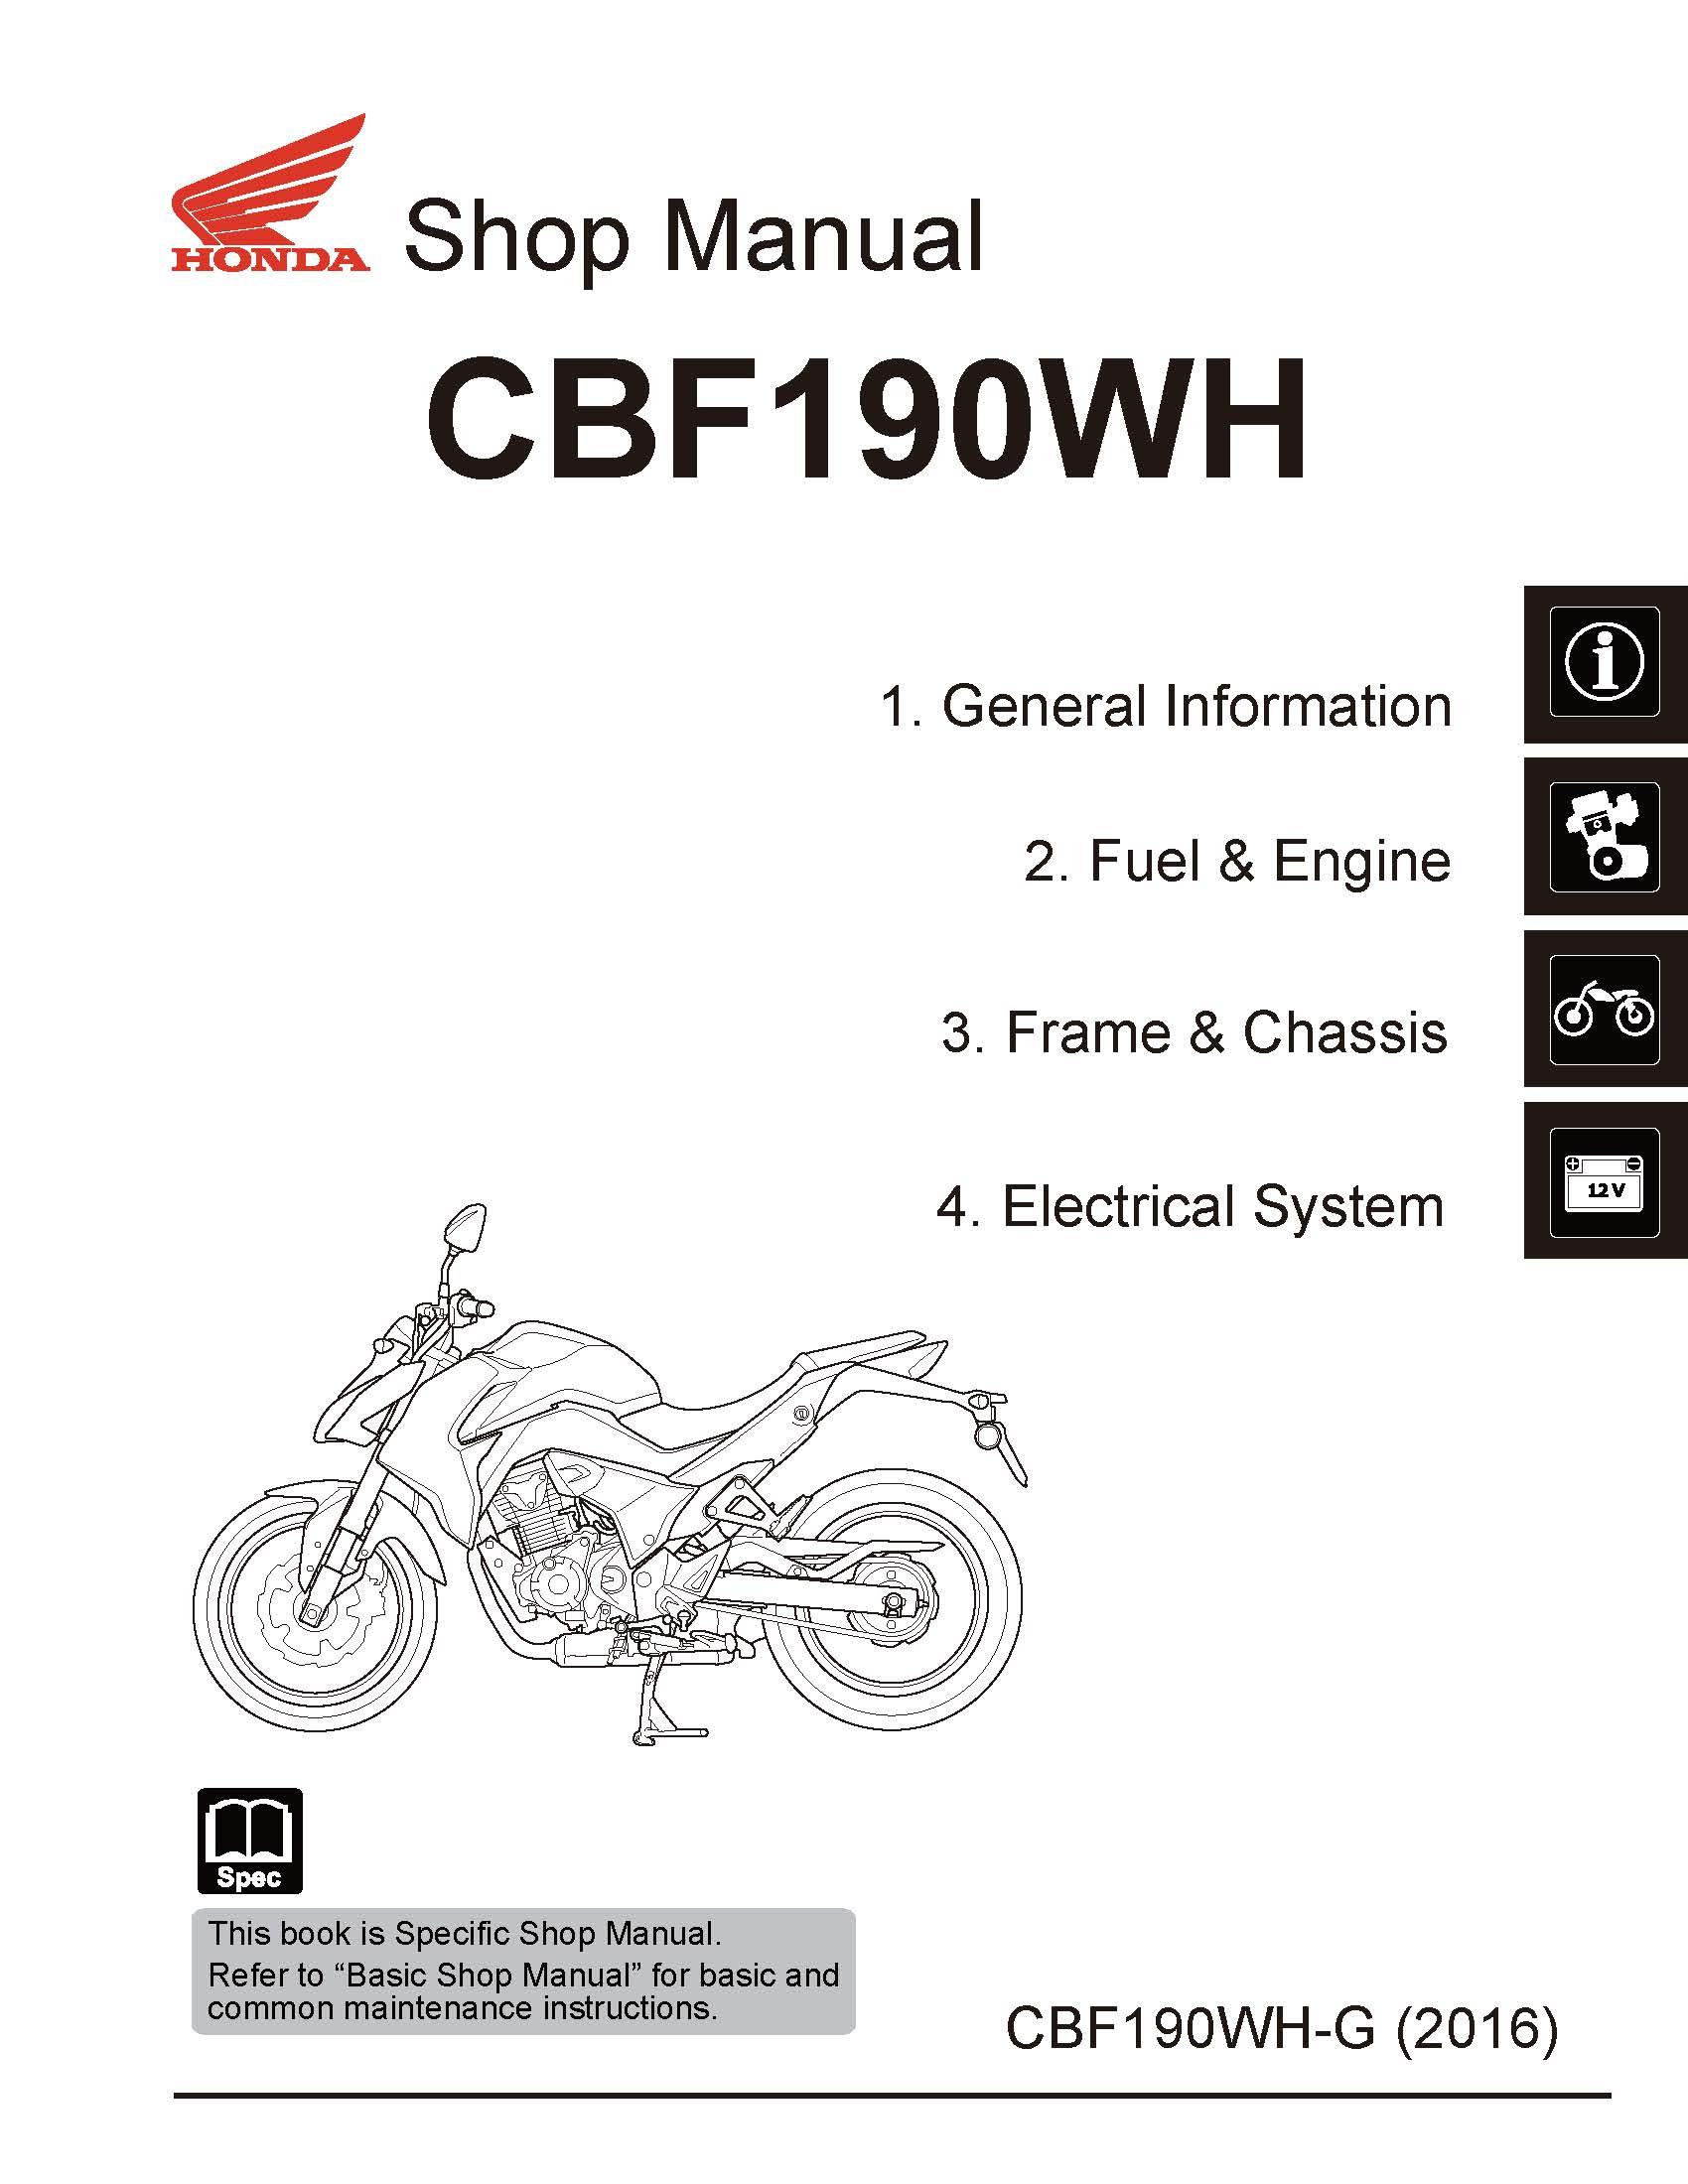 Workshop manual for Honda CBF190WH-G (2016)